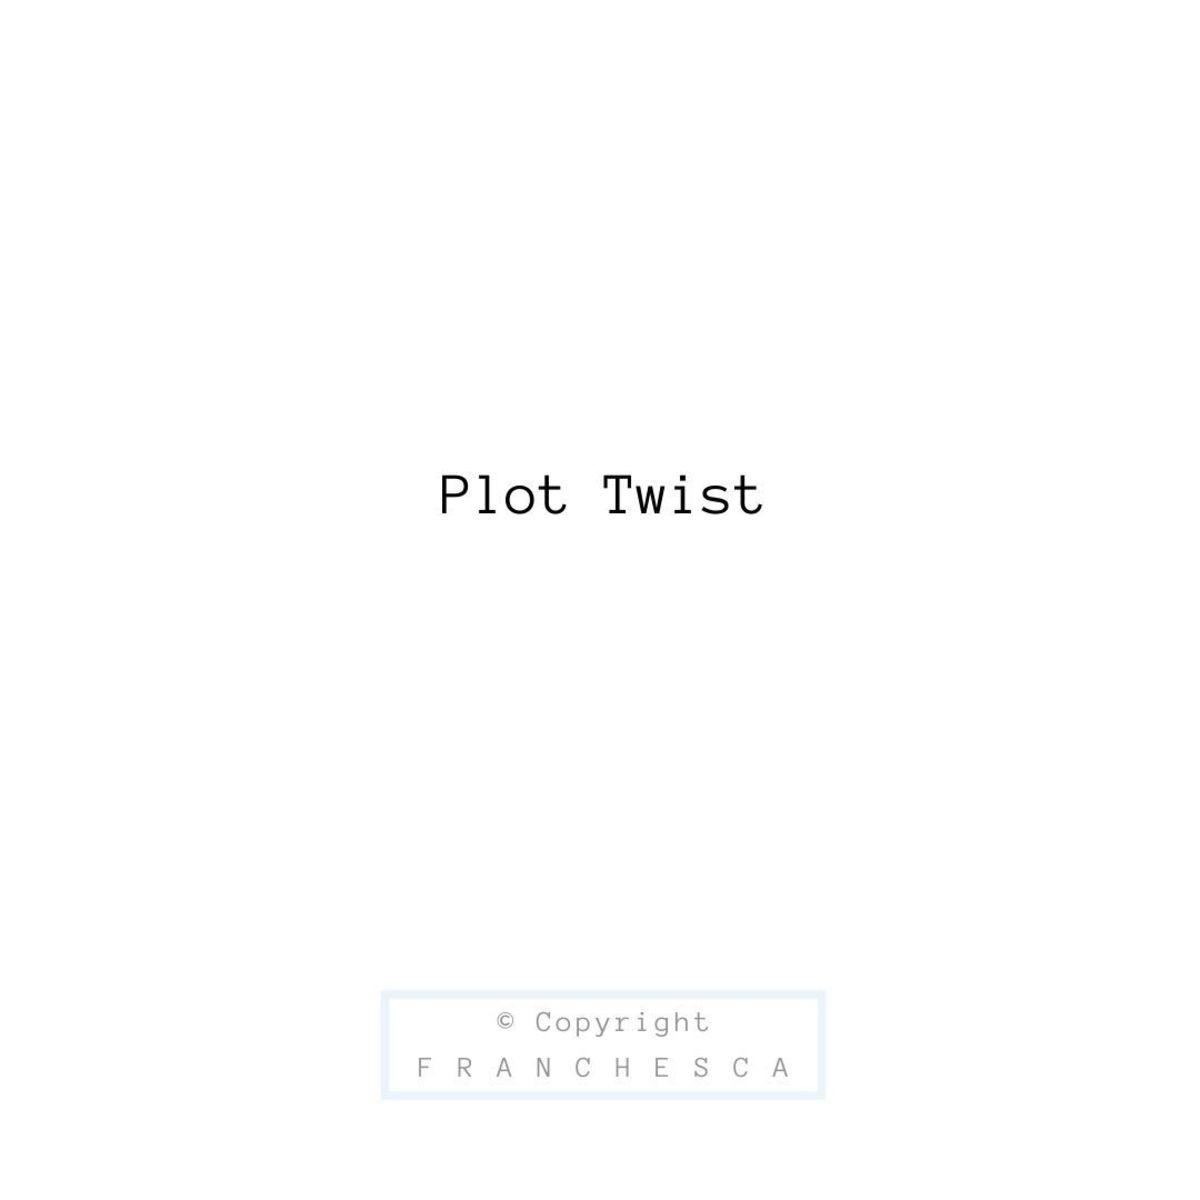 169th Article: Plot Twist